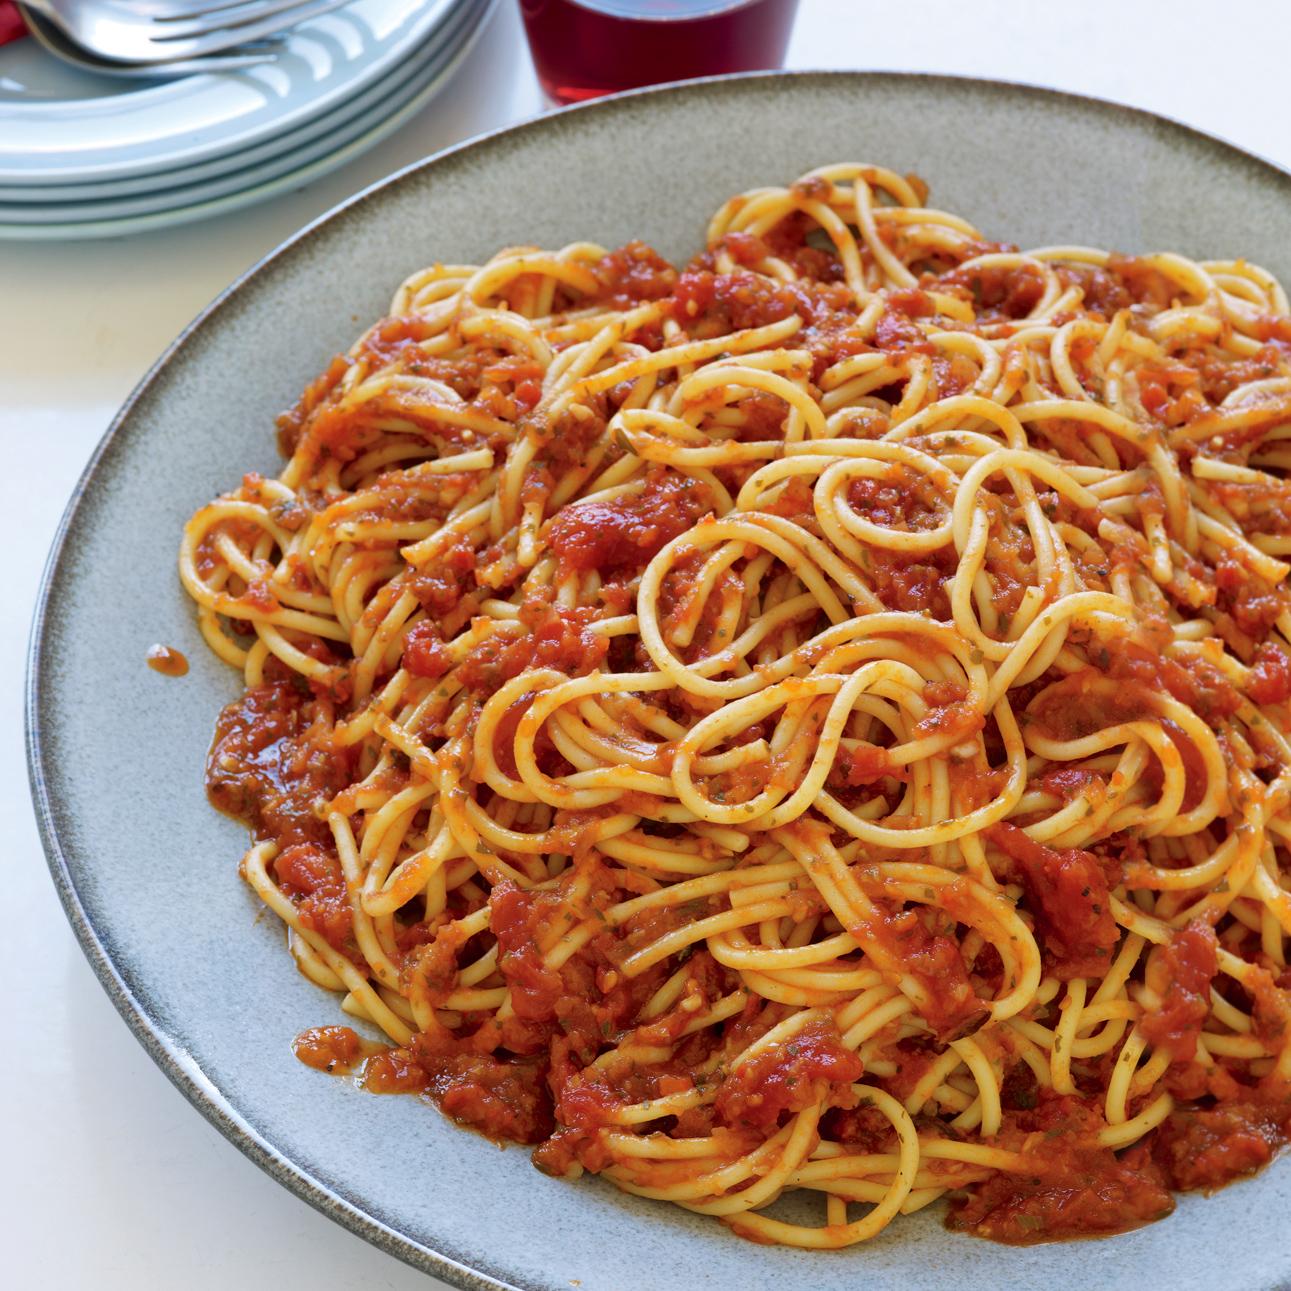 Spicy Sicilian Spaghetti with Anchovies